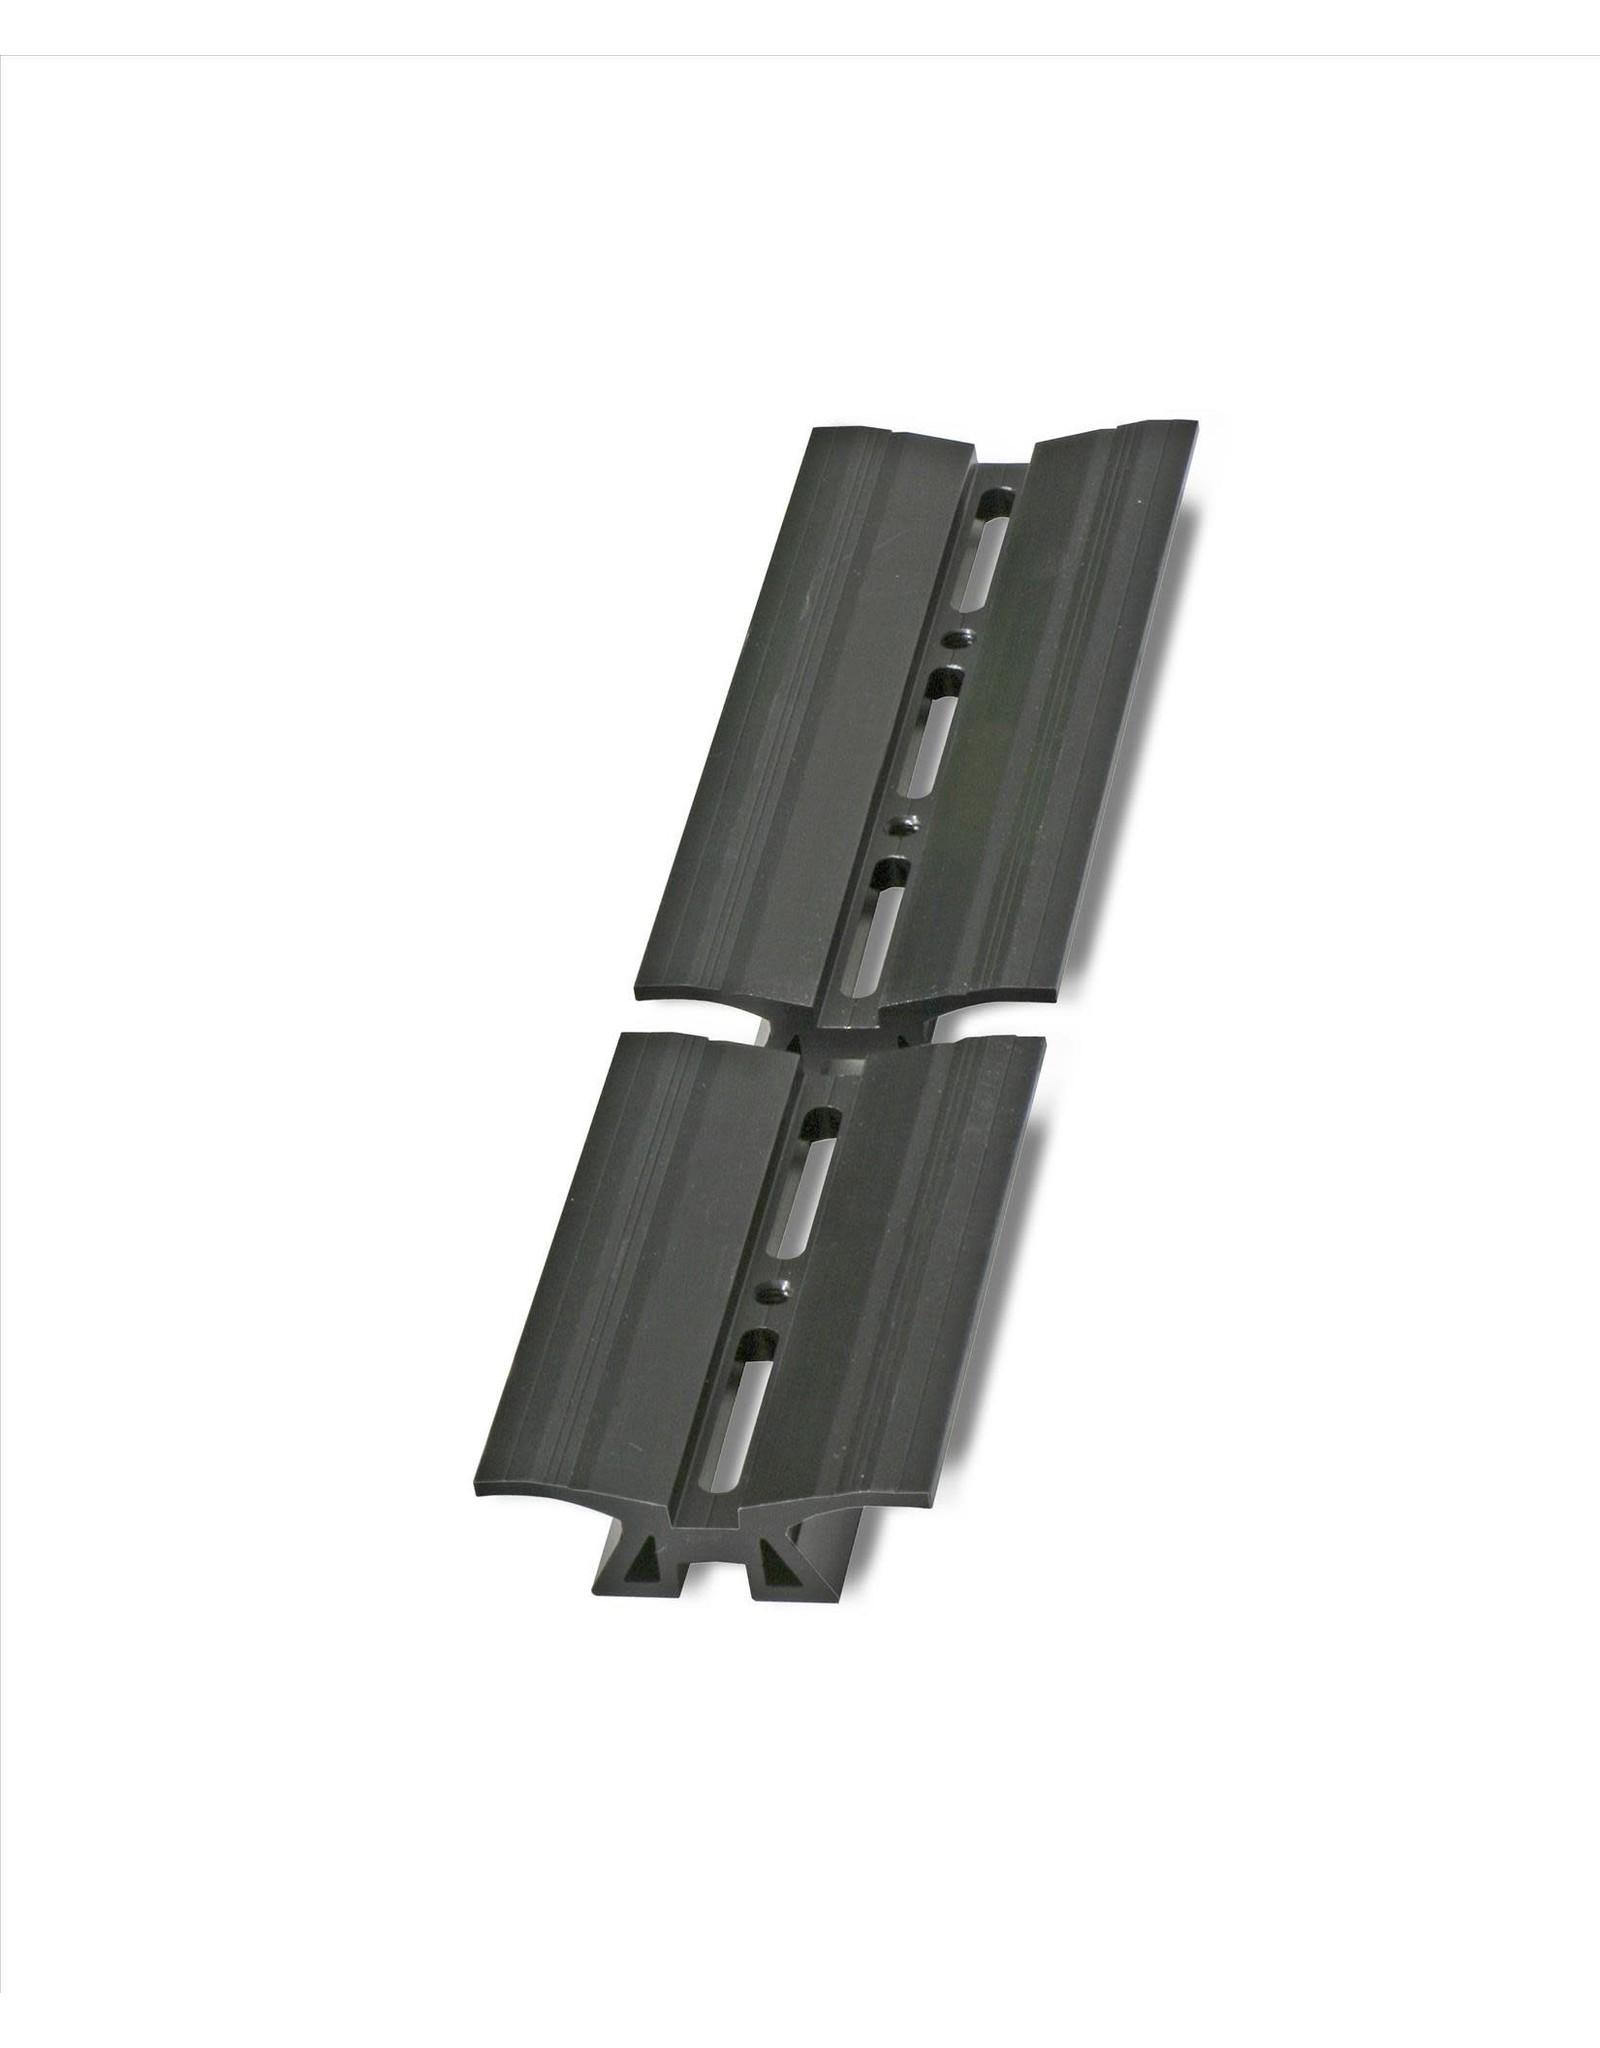 Baader Planetarium Baader Z(AP)-200 Dove tail bar, 200mm